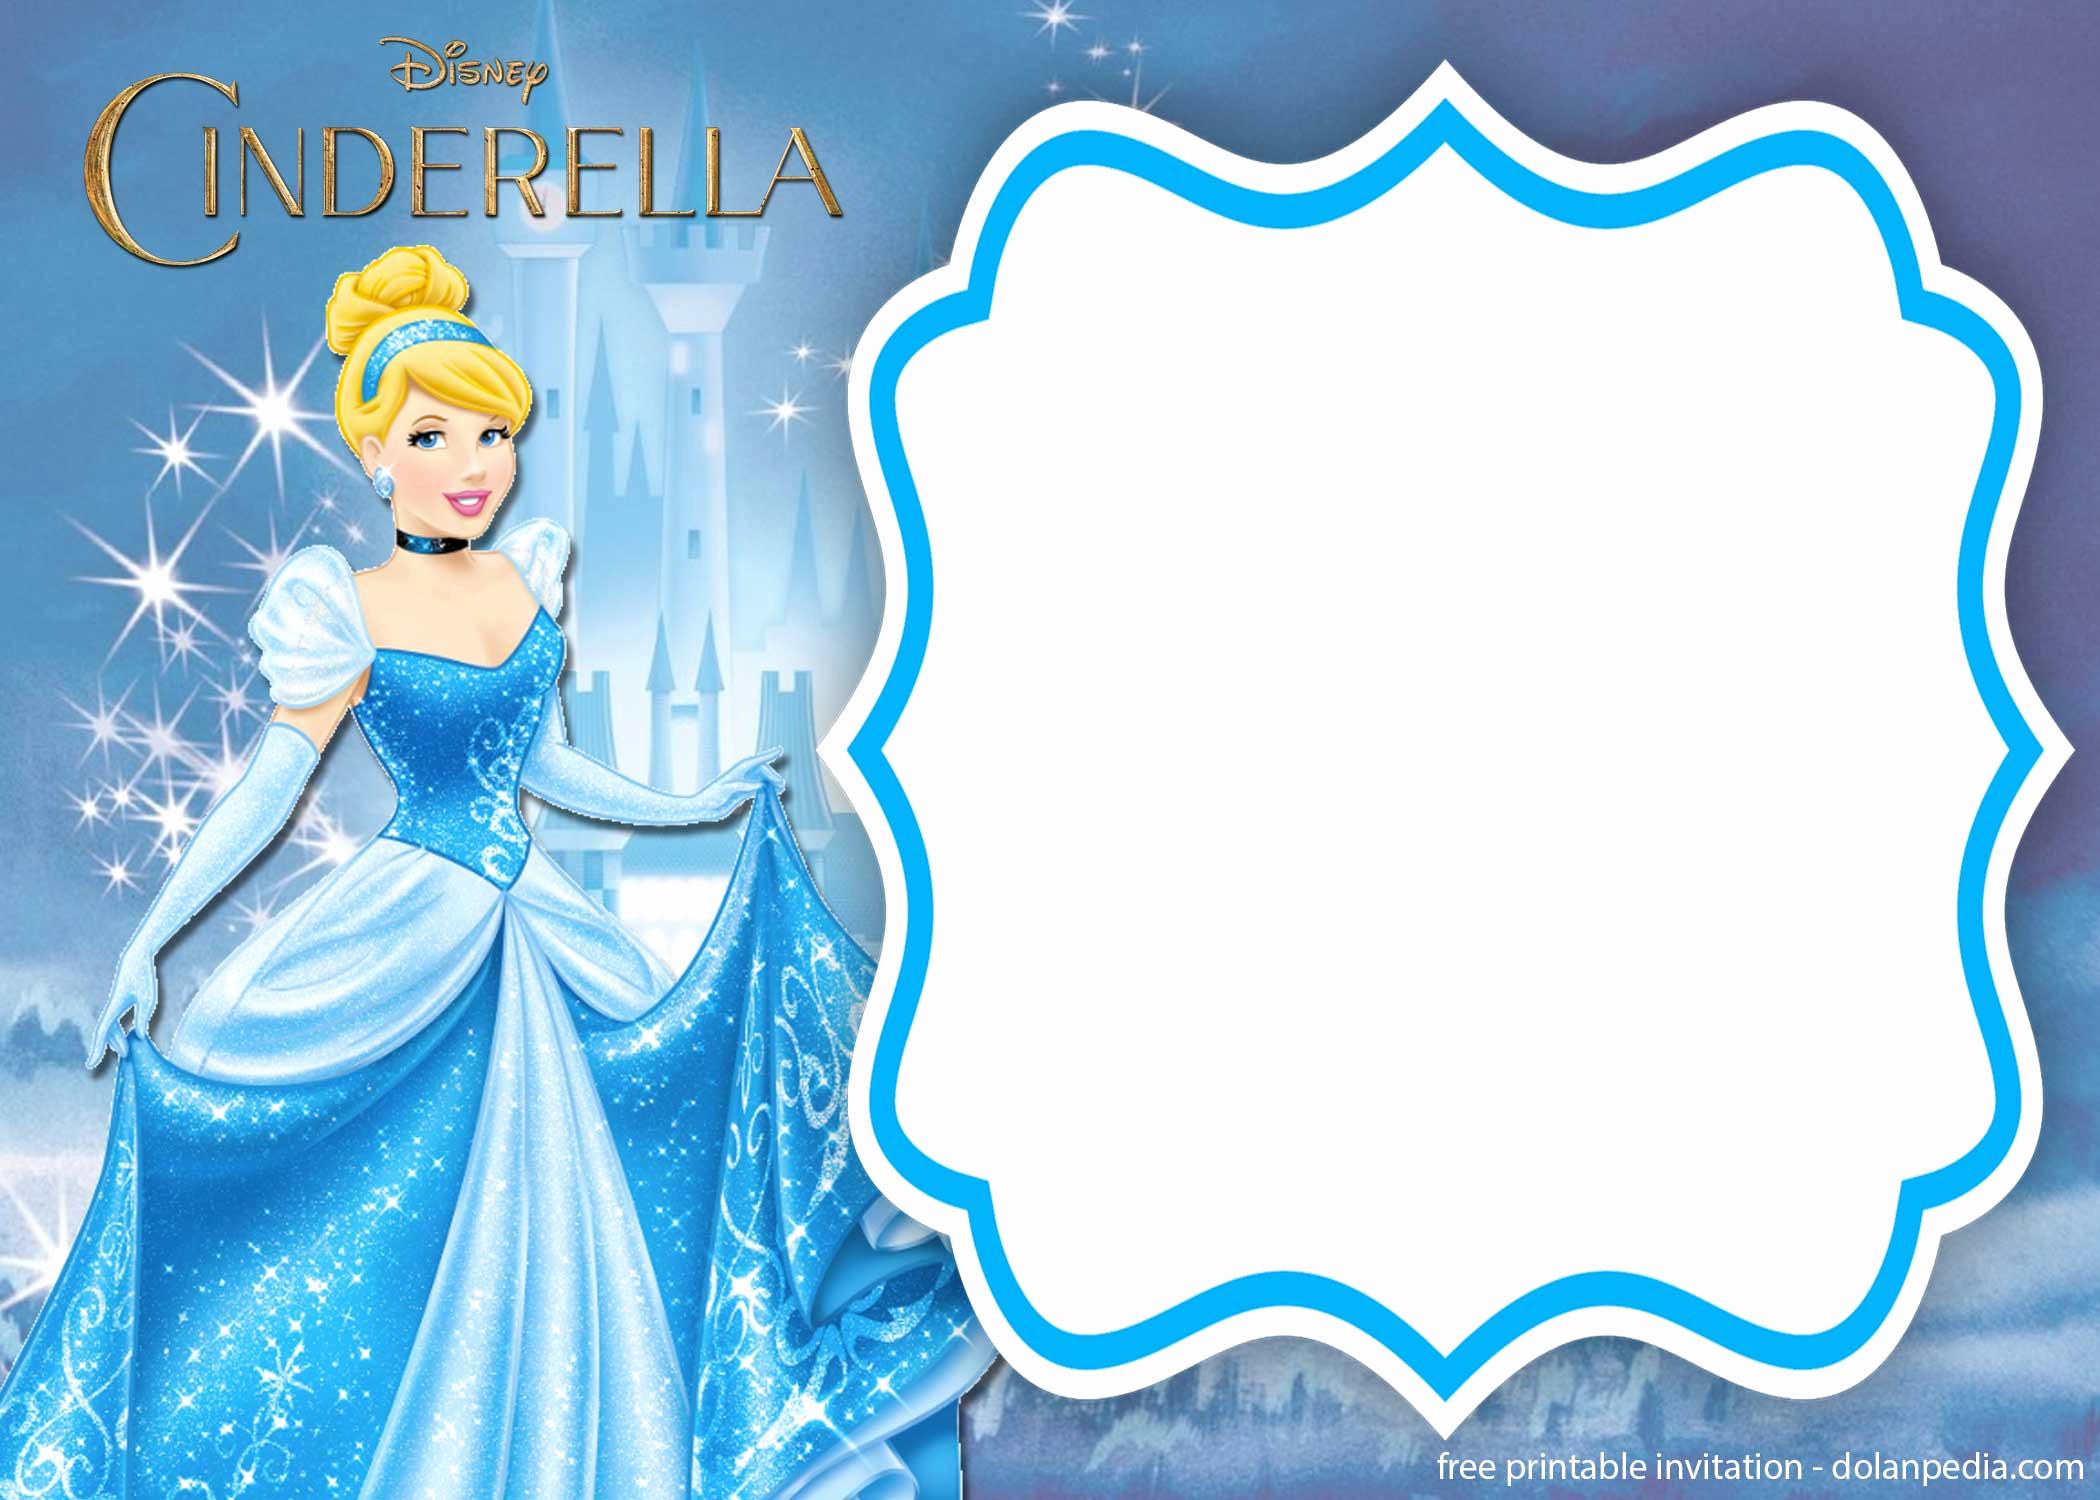 Cinderella Invitation Template Free New Free Printable Cinderella Royal Invitation Templates